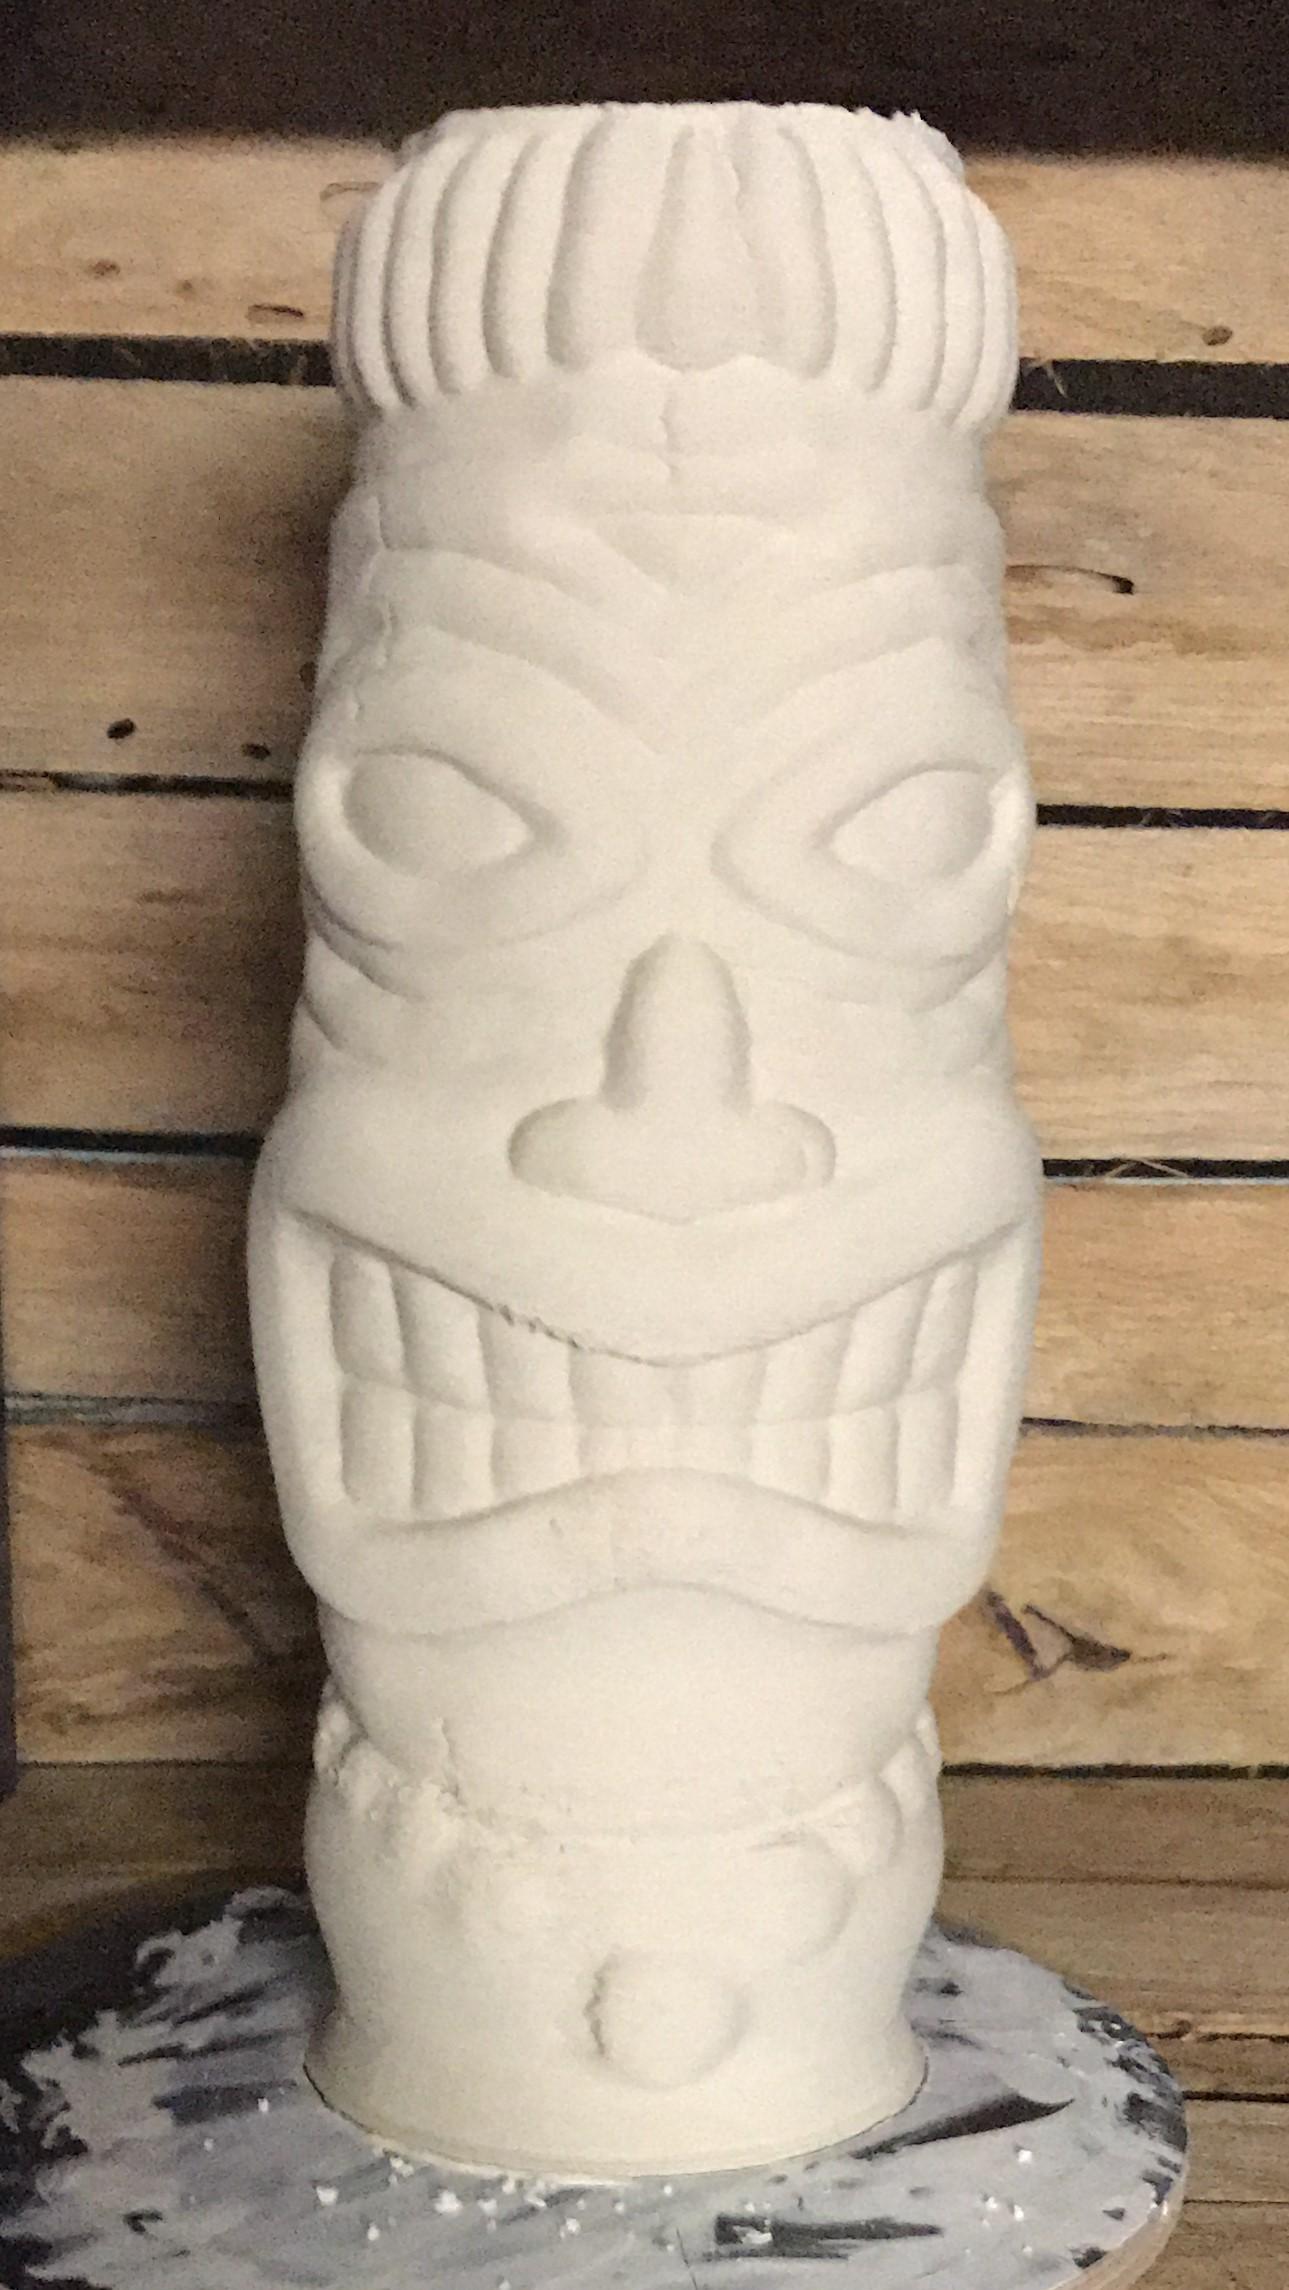 deMINIfabriek 3D print LDM tiki beeld porcelein